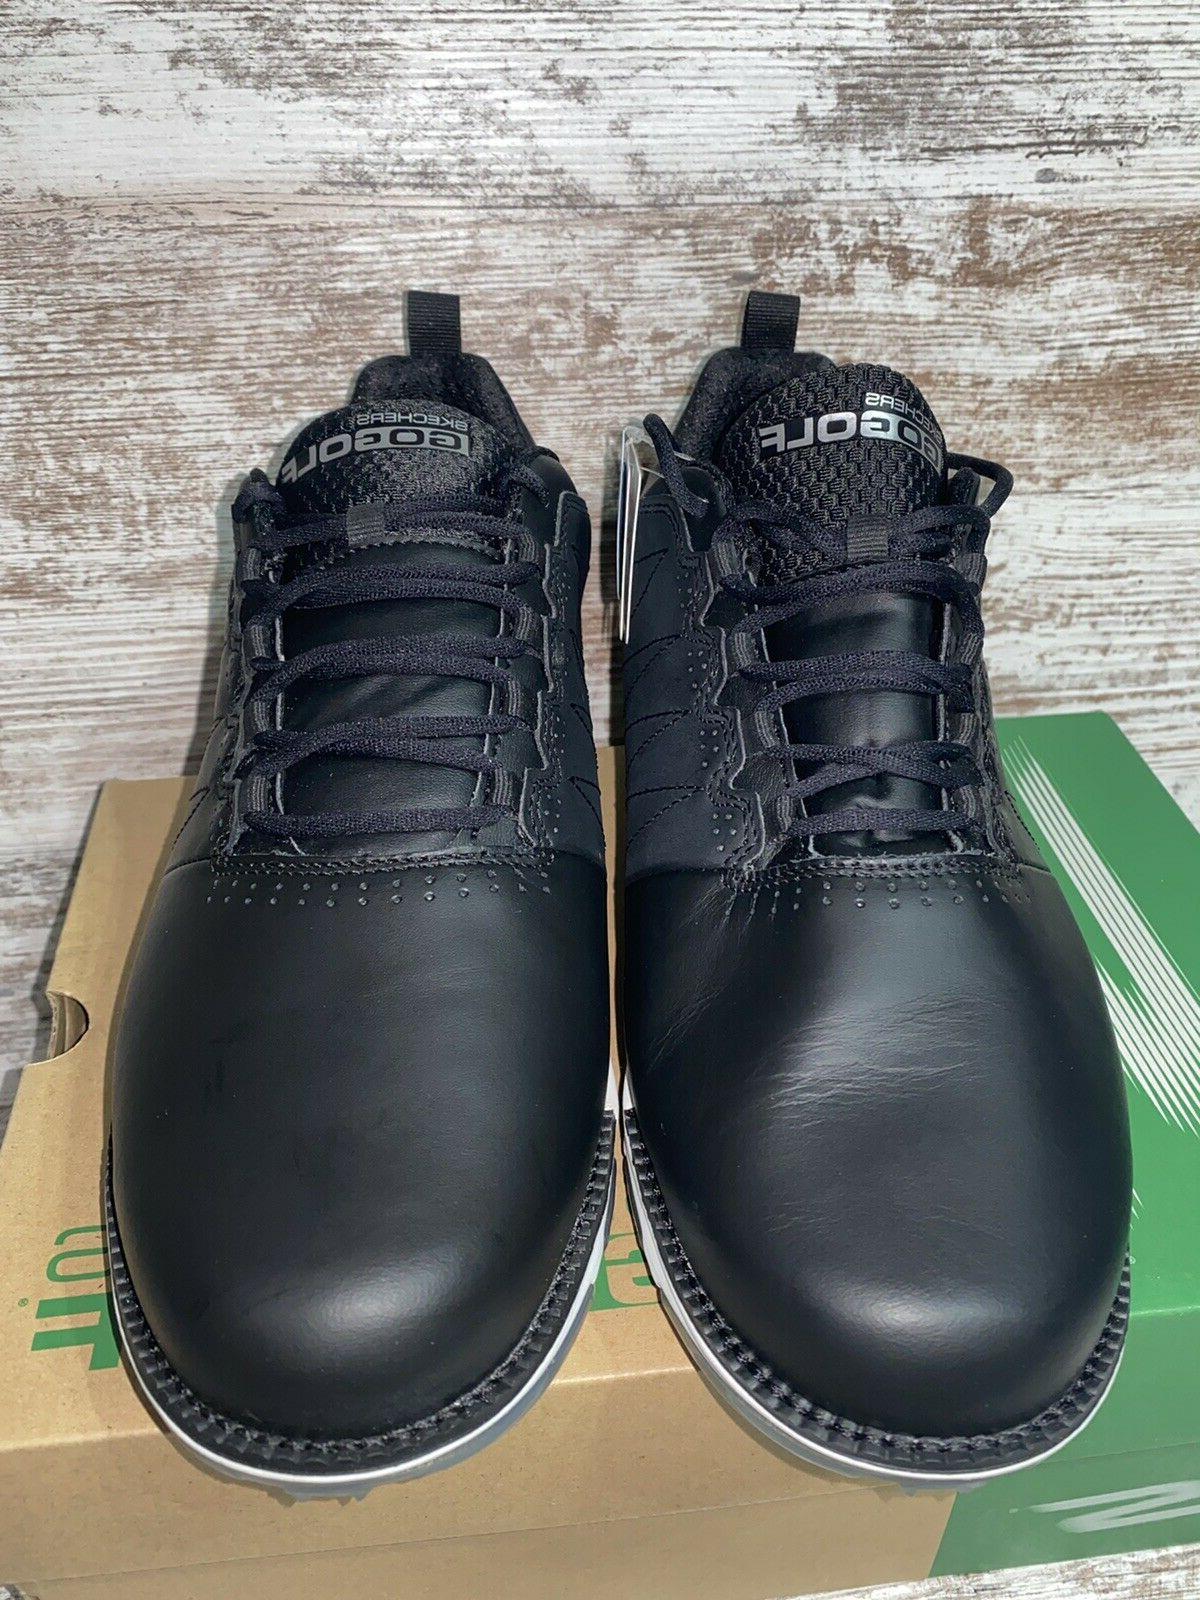 NEW Skechers GO GOLF Elite Shoes Width